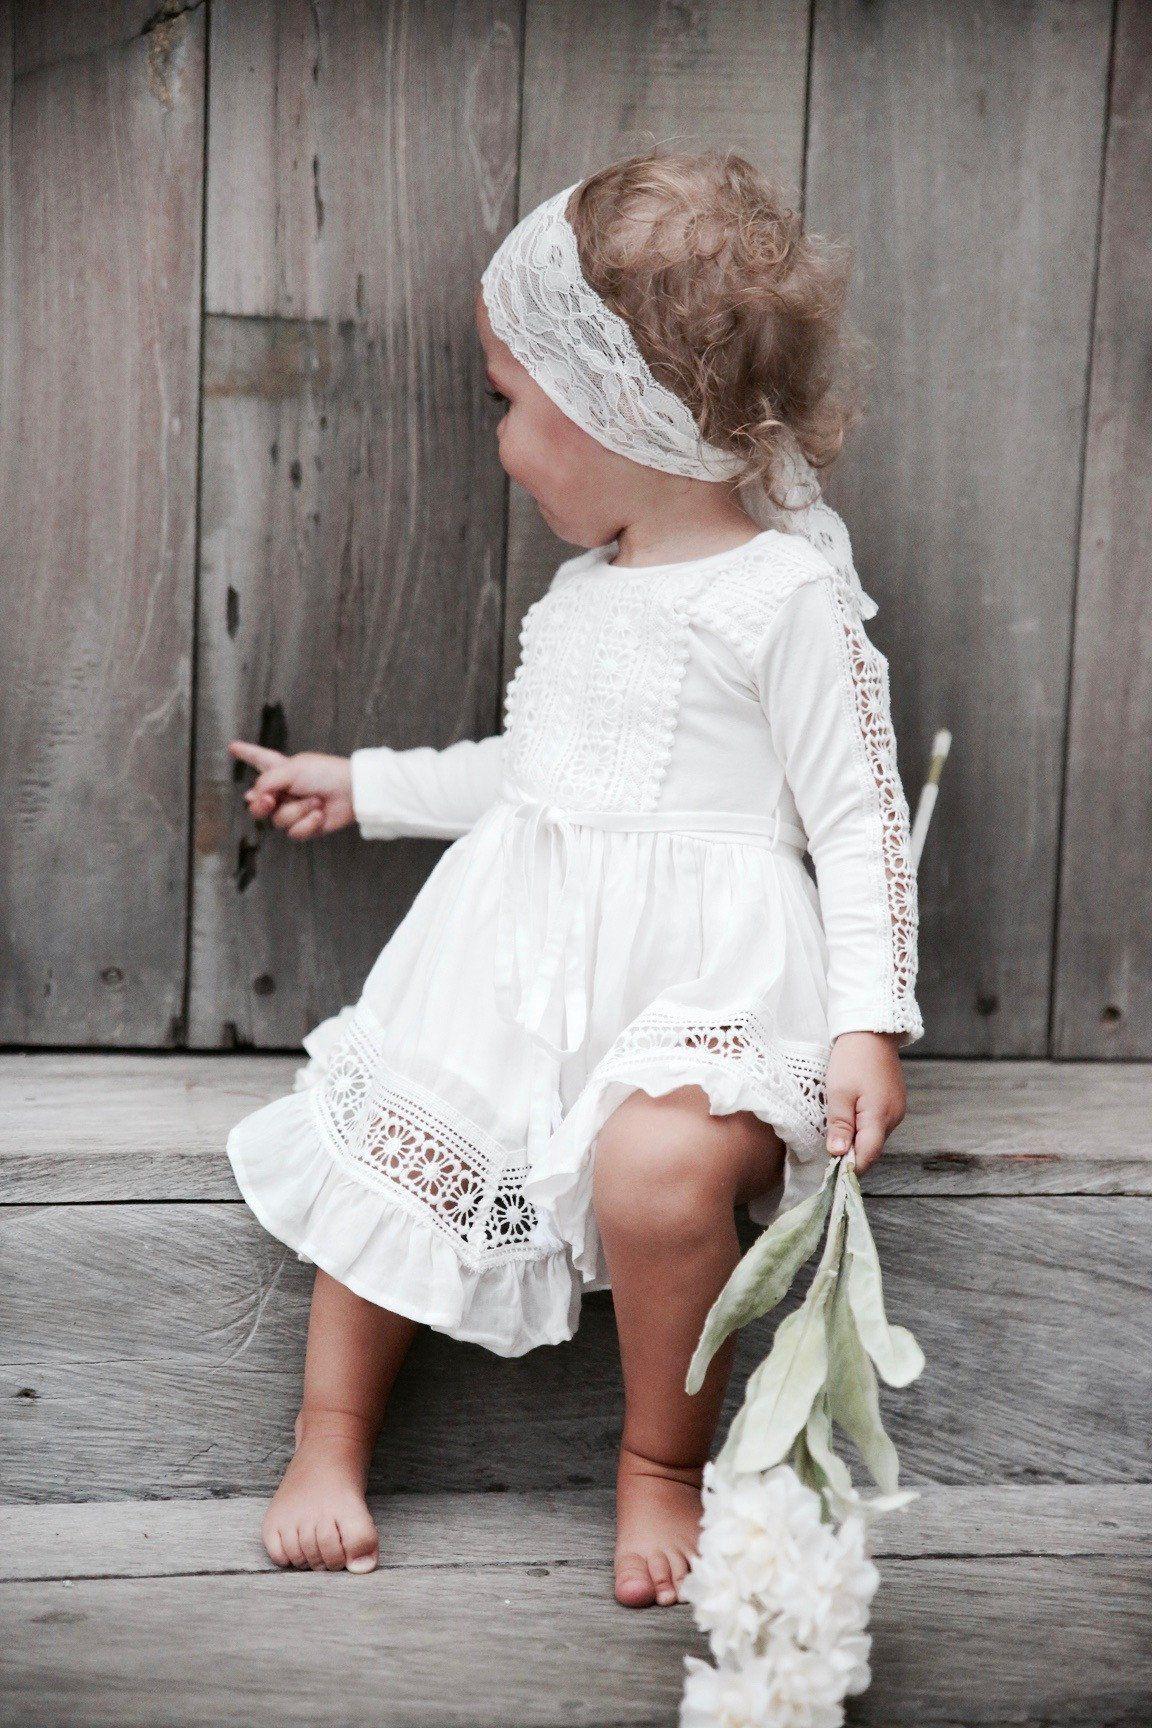 ivory baby dress white ivory  flower girl dress baby girl dress christening dress white baby dress baptism dress vintage baby dress